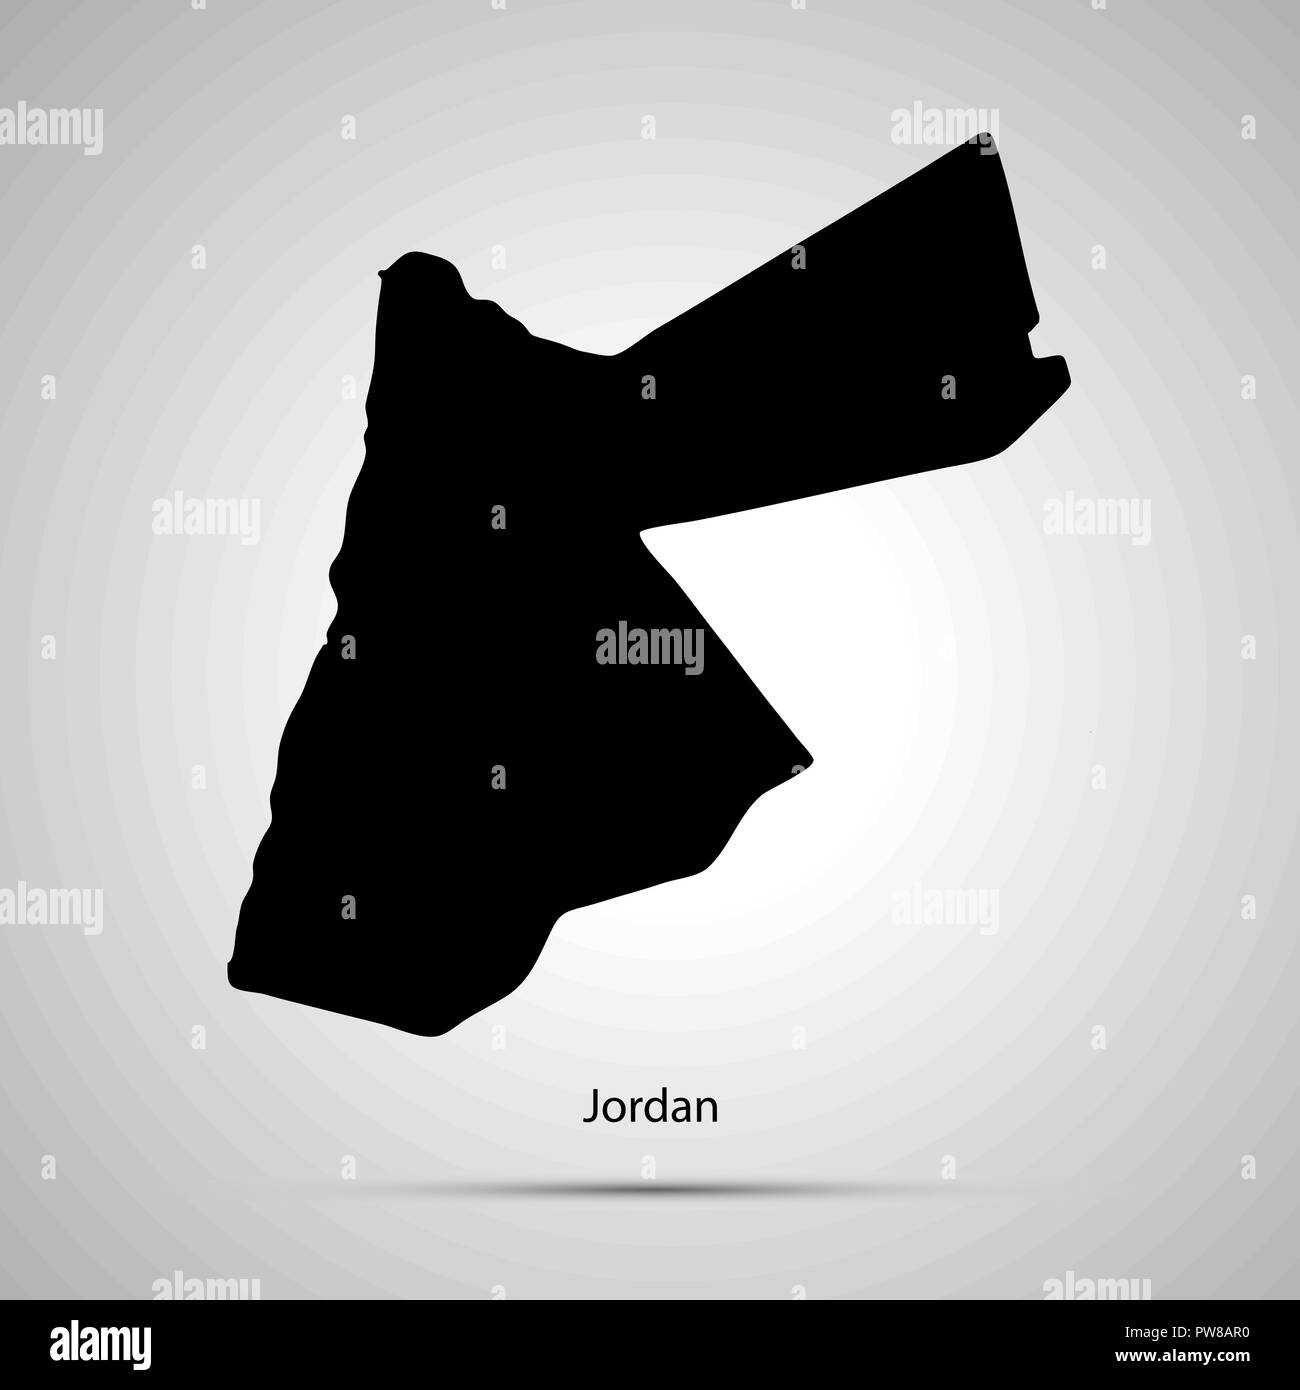 Jordan country map, simple black silhouette on gray - Stock Image